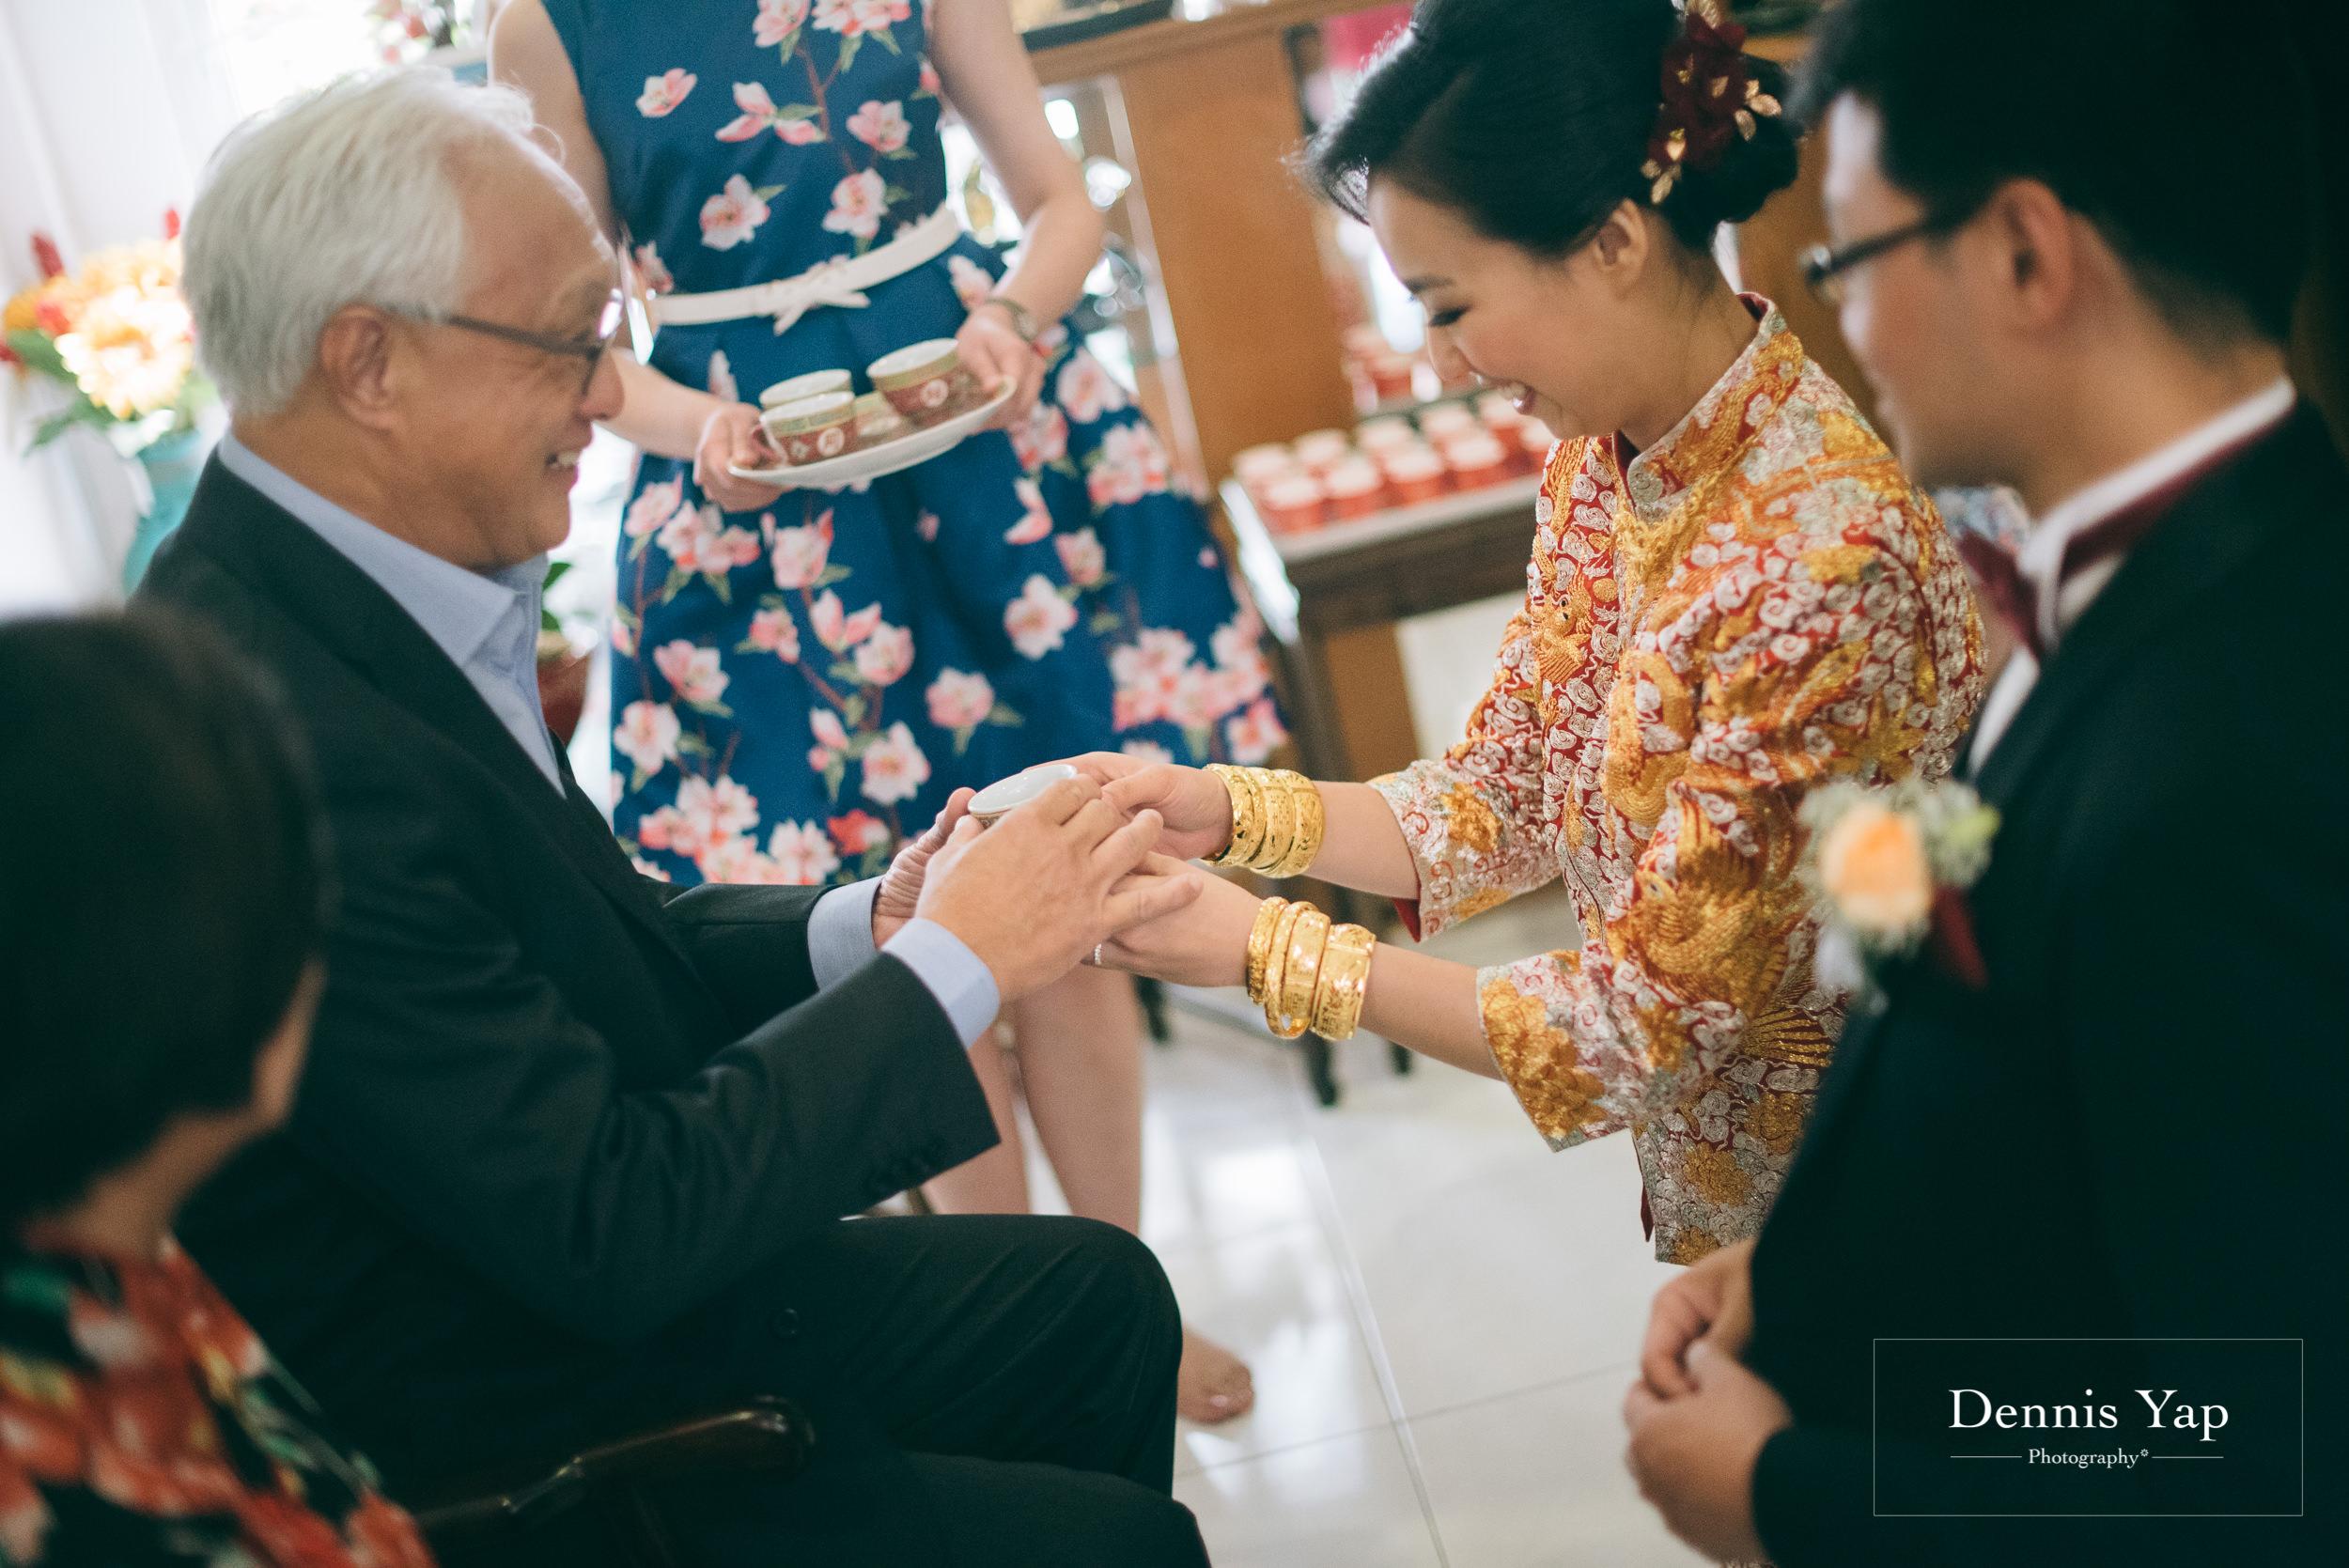 wai keong jenny wedding day bangsar dennis yap photography emotions beloved family-19.jpg